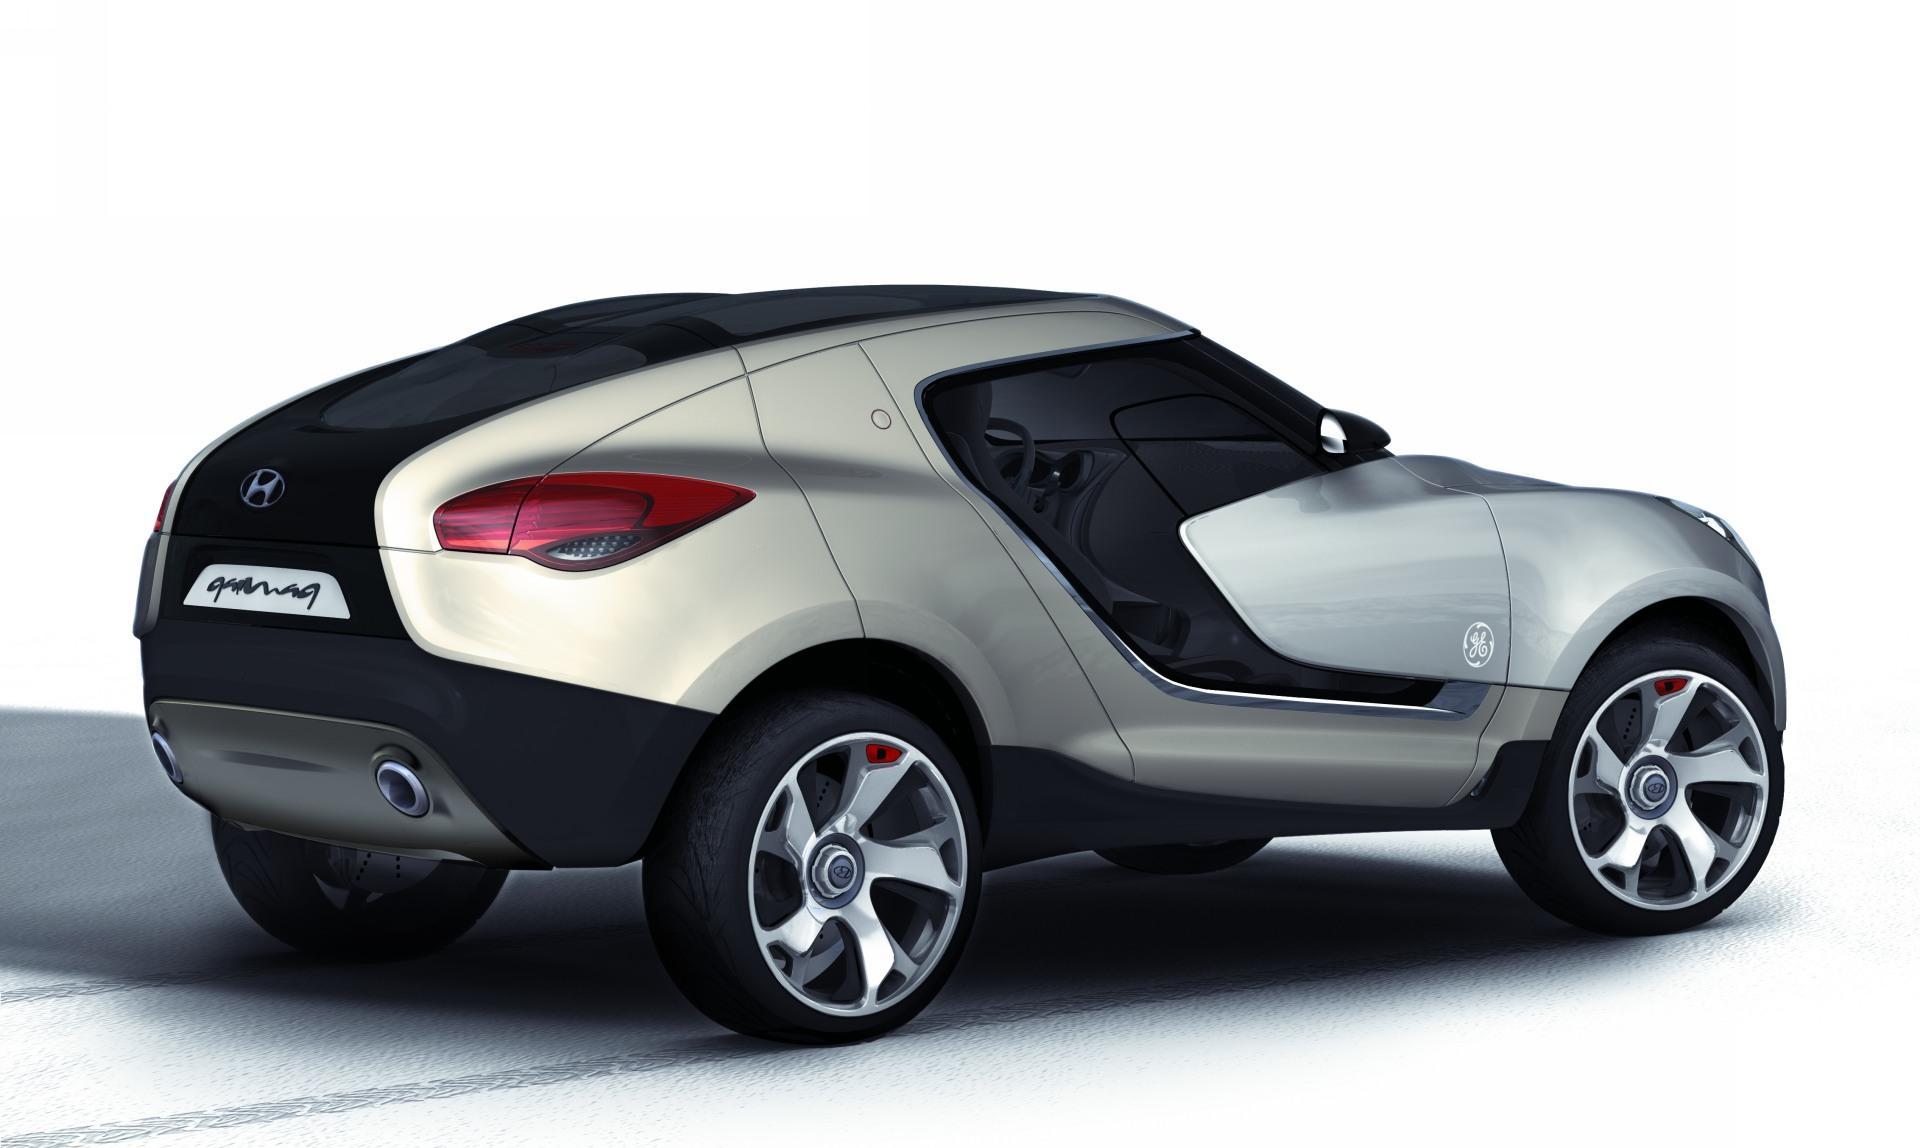 2007 Hyundai Qarmaq Concept Image